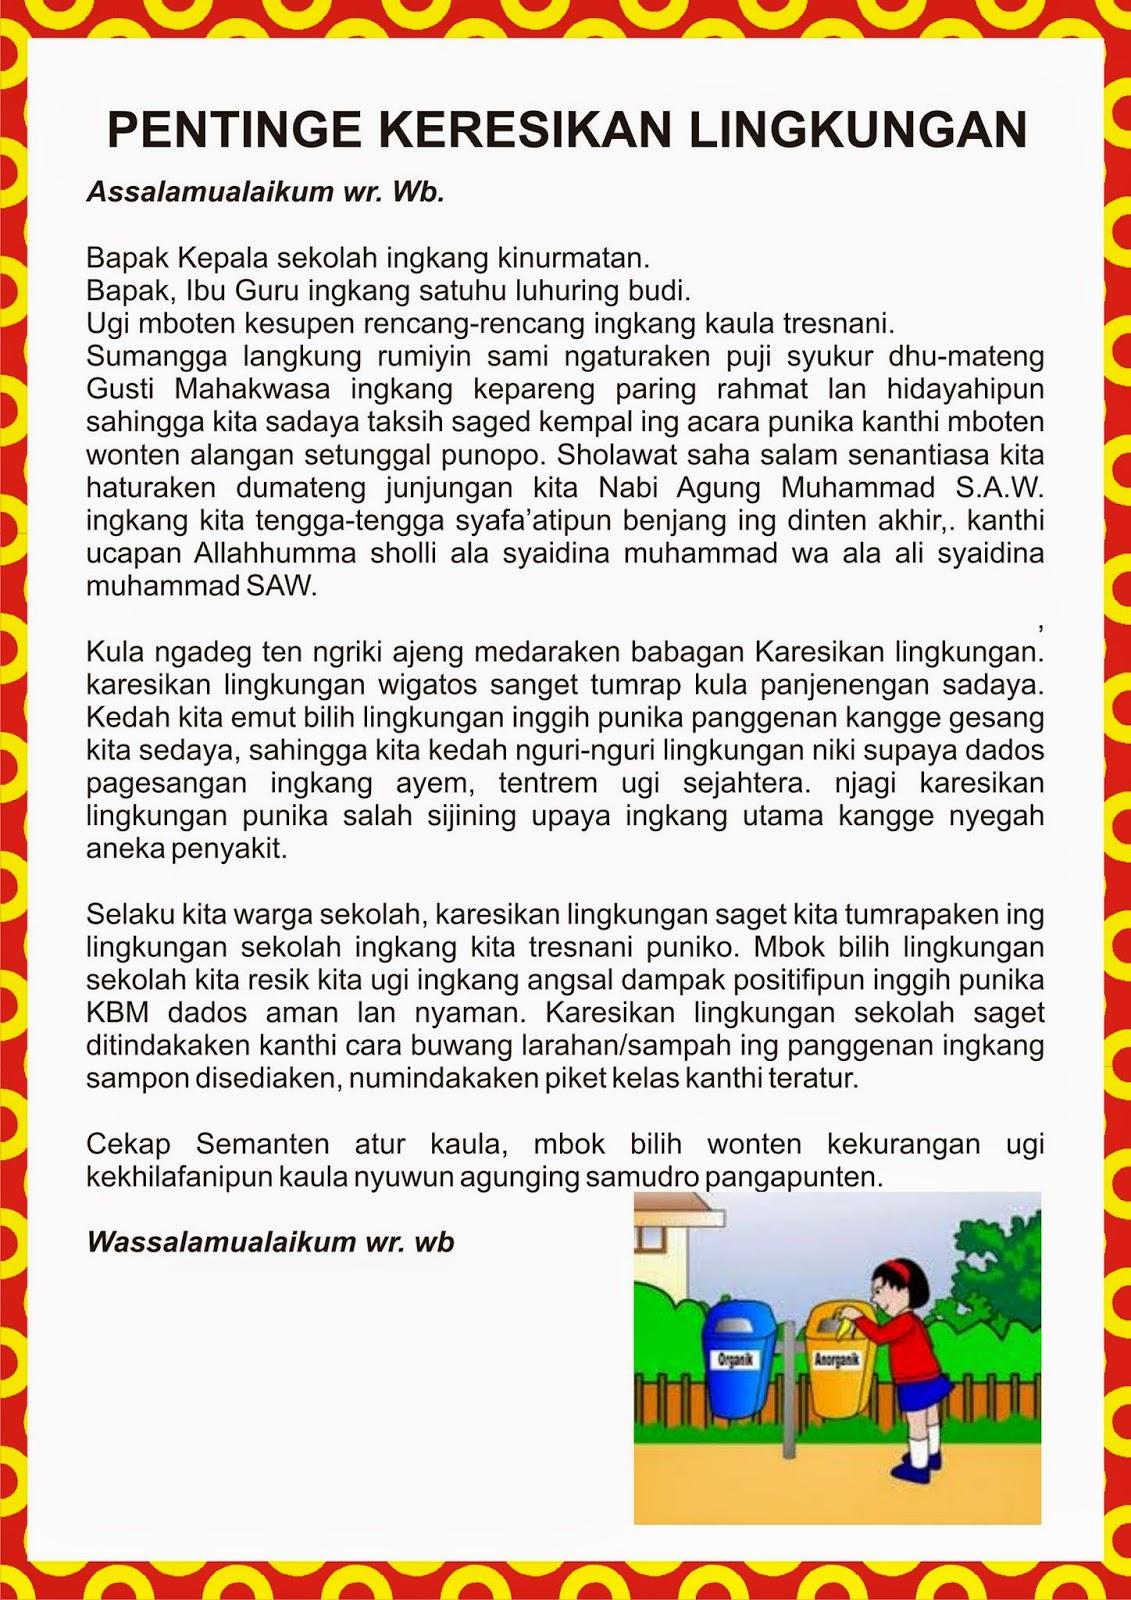 Artikel Tentang Lingkungan Artikel Lingkungan Hidup Artikel Indonesia Naskah Sesorah Bahasa Jawa Tentang Kebersihan